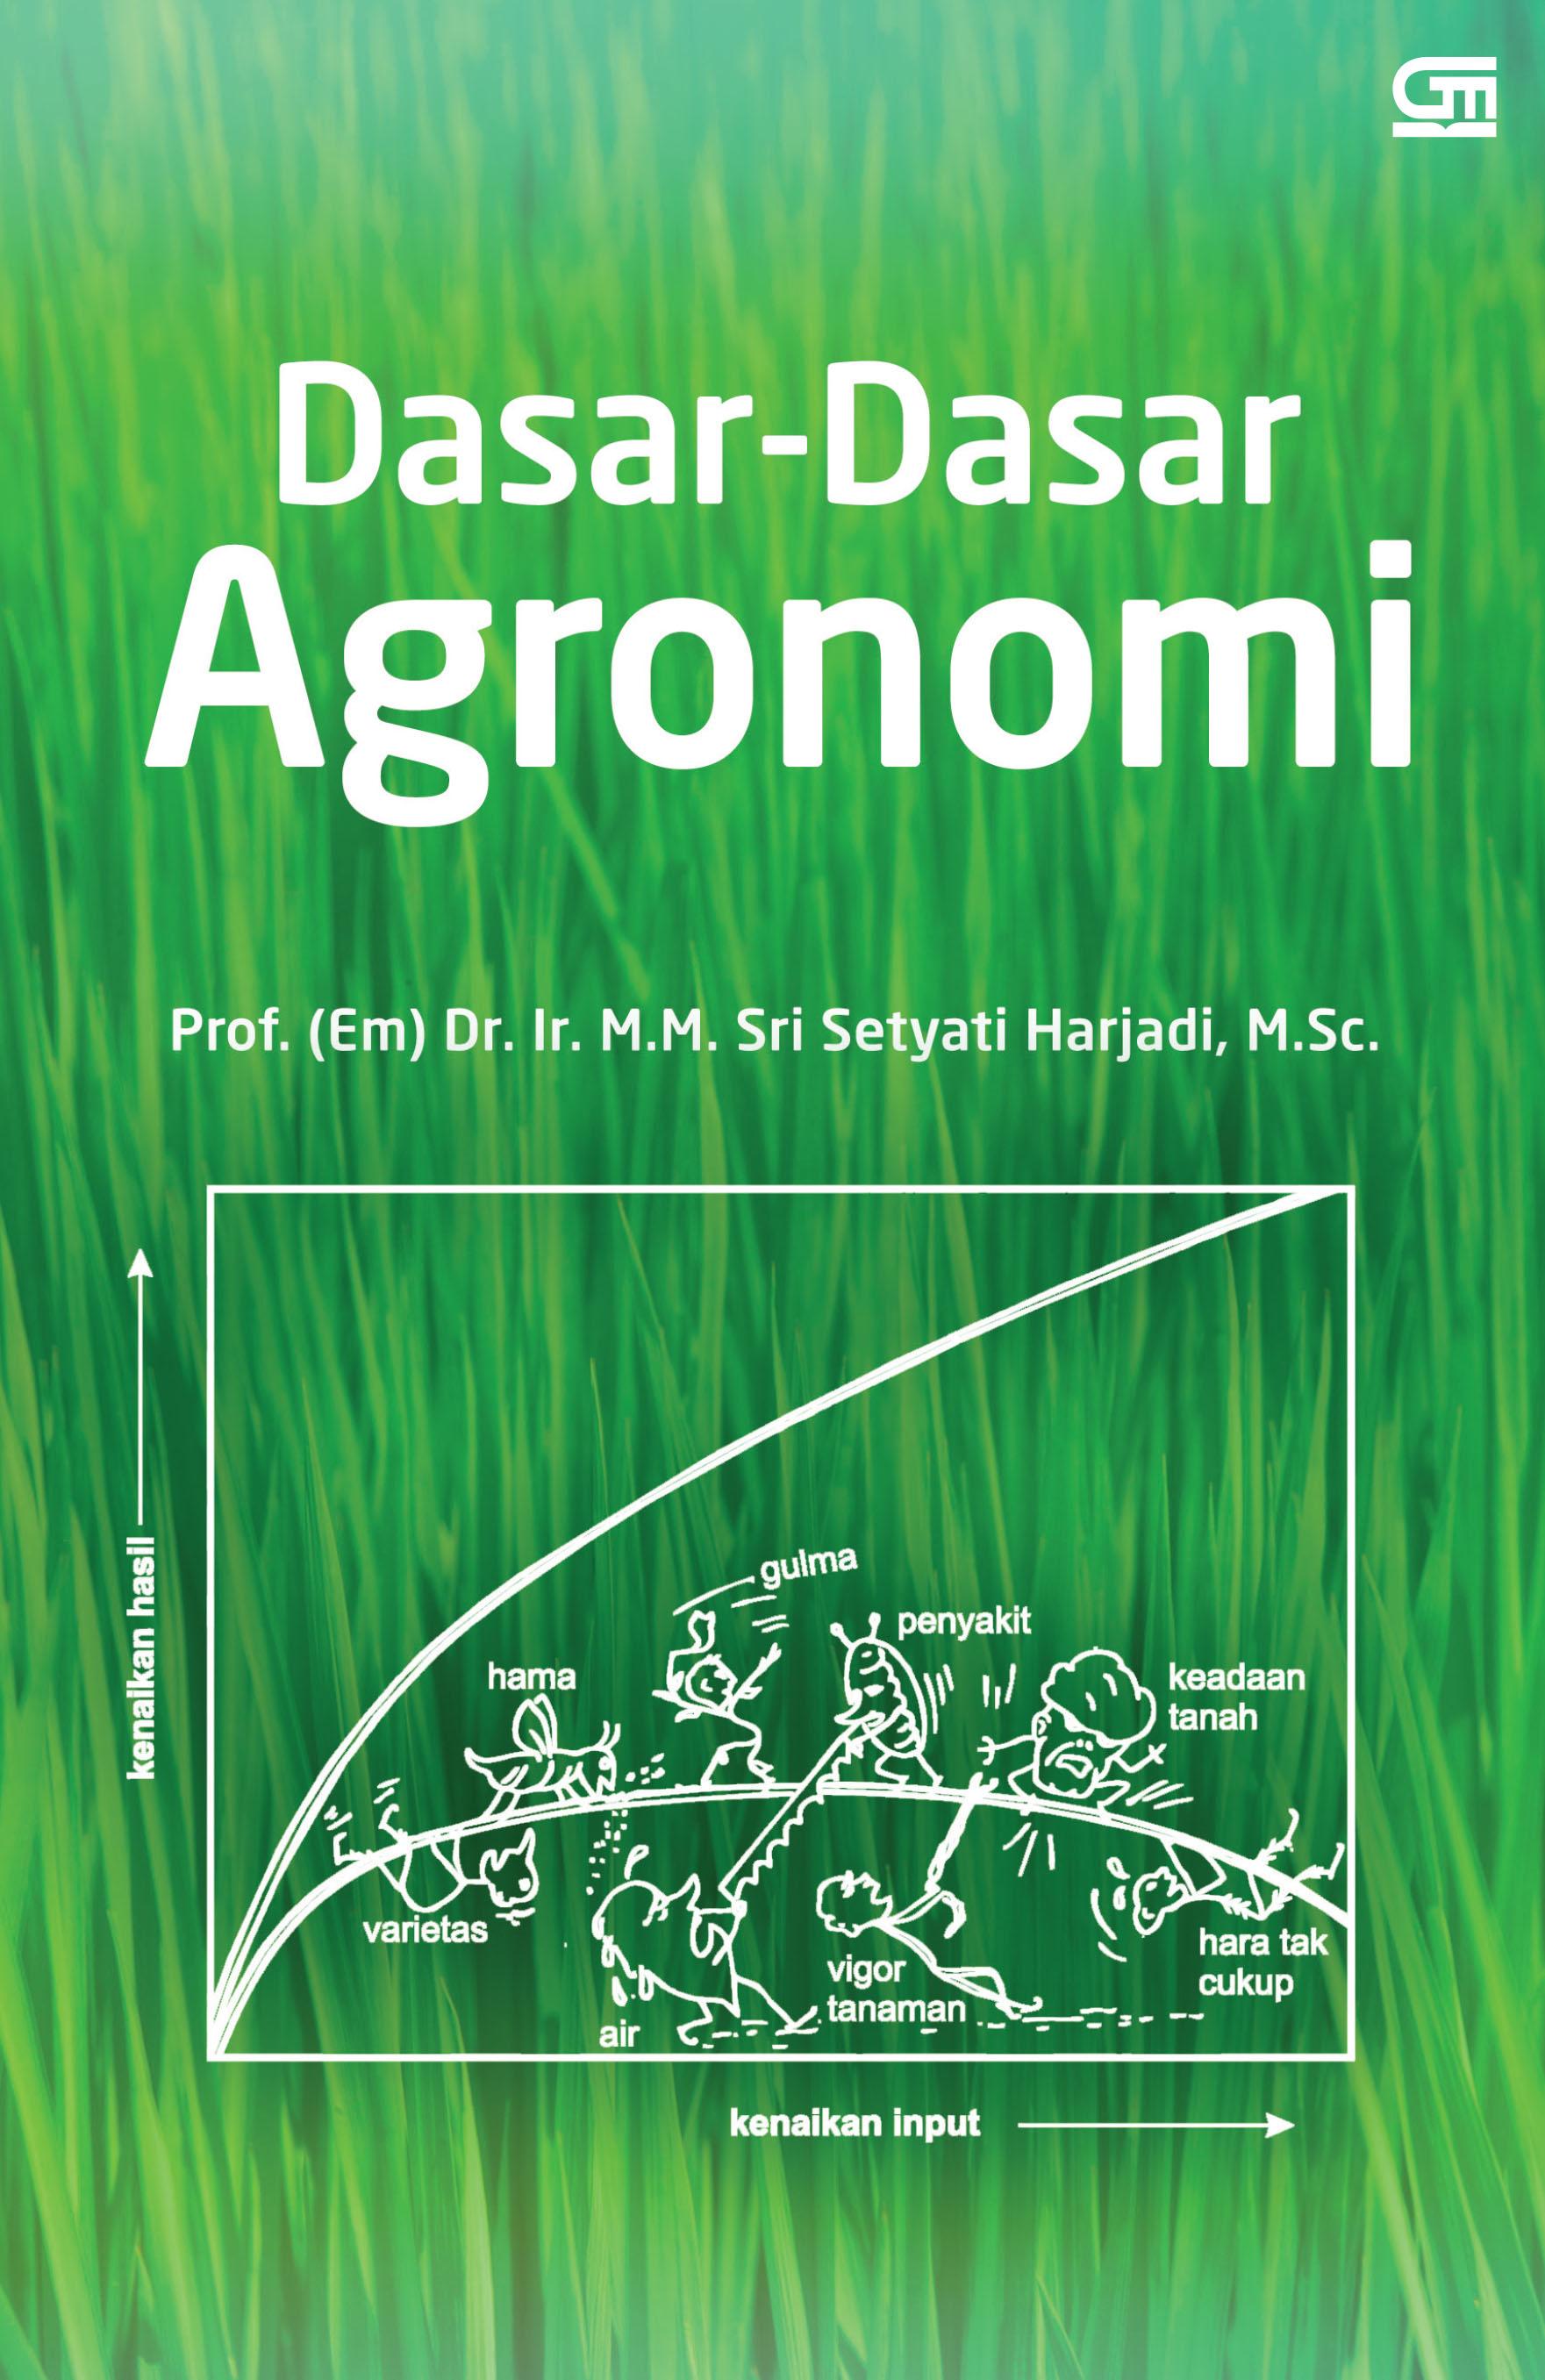 Dasar-dasar Agronomi